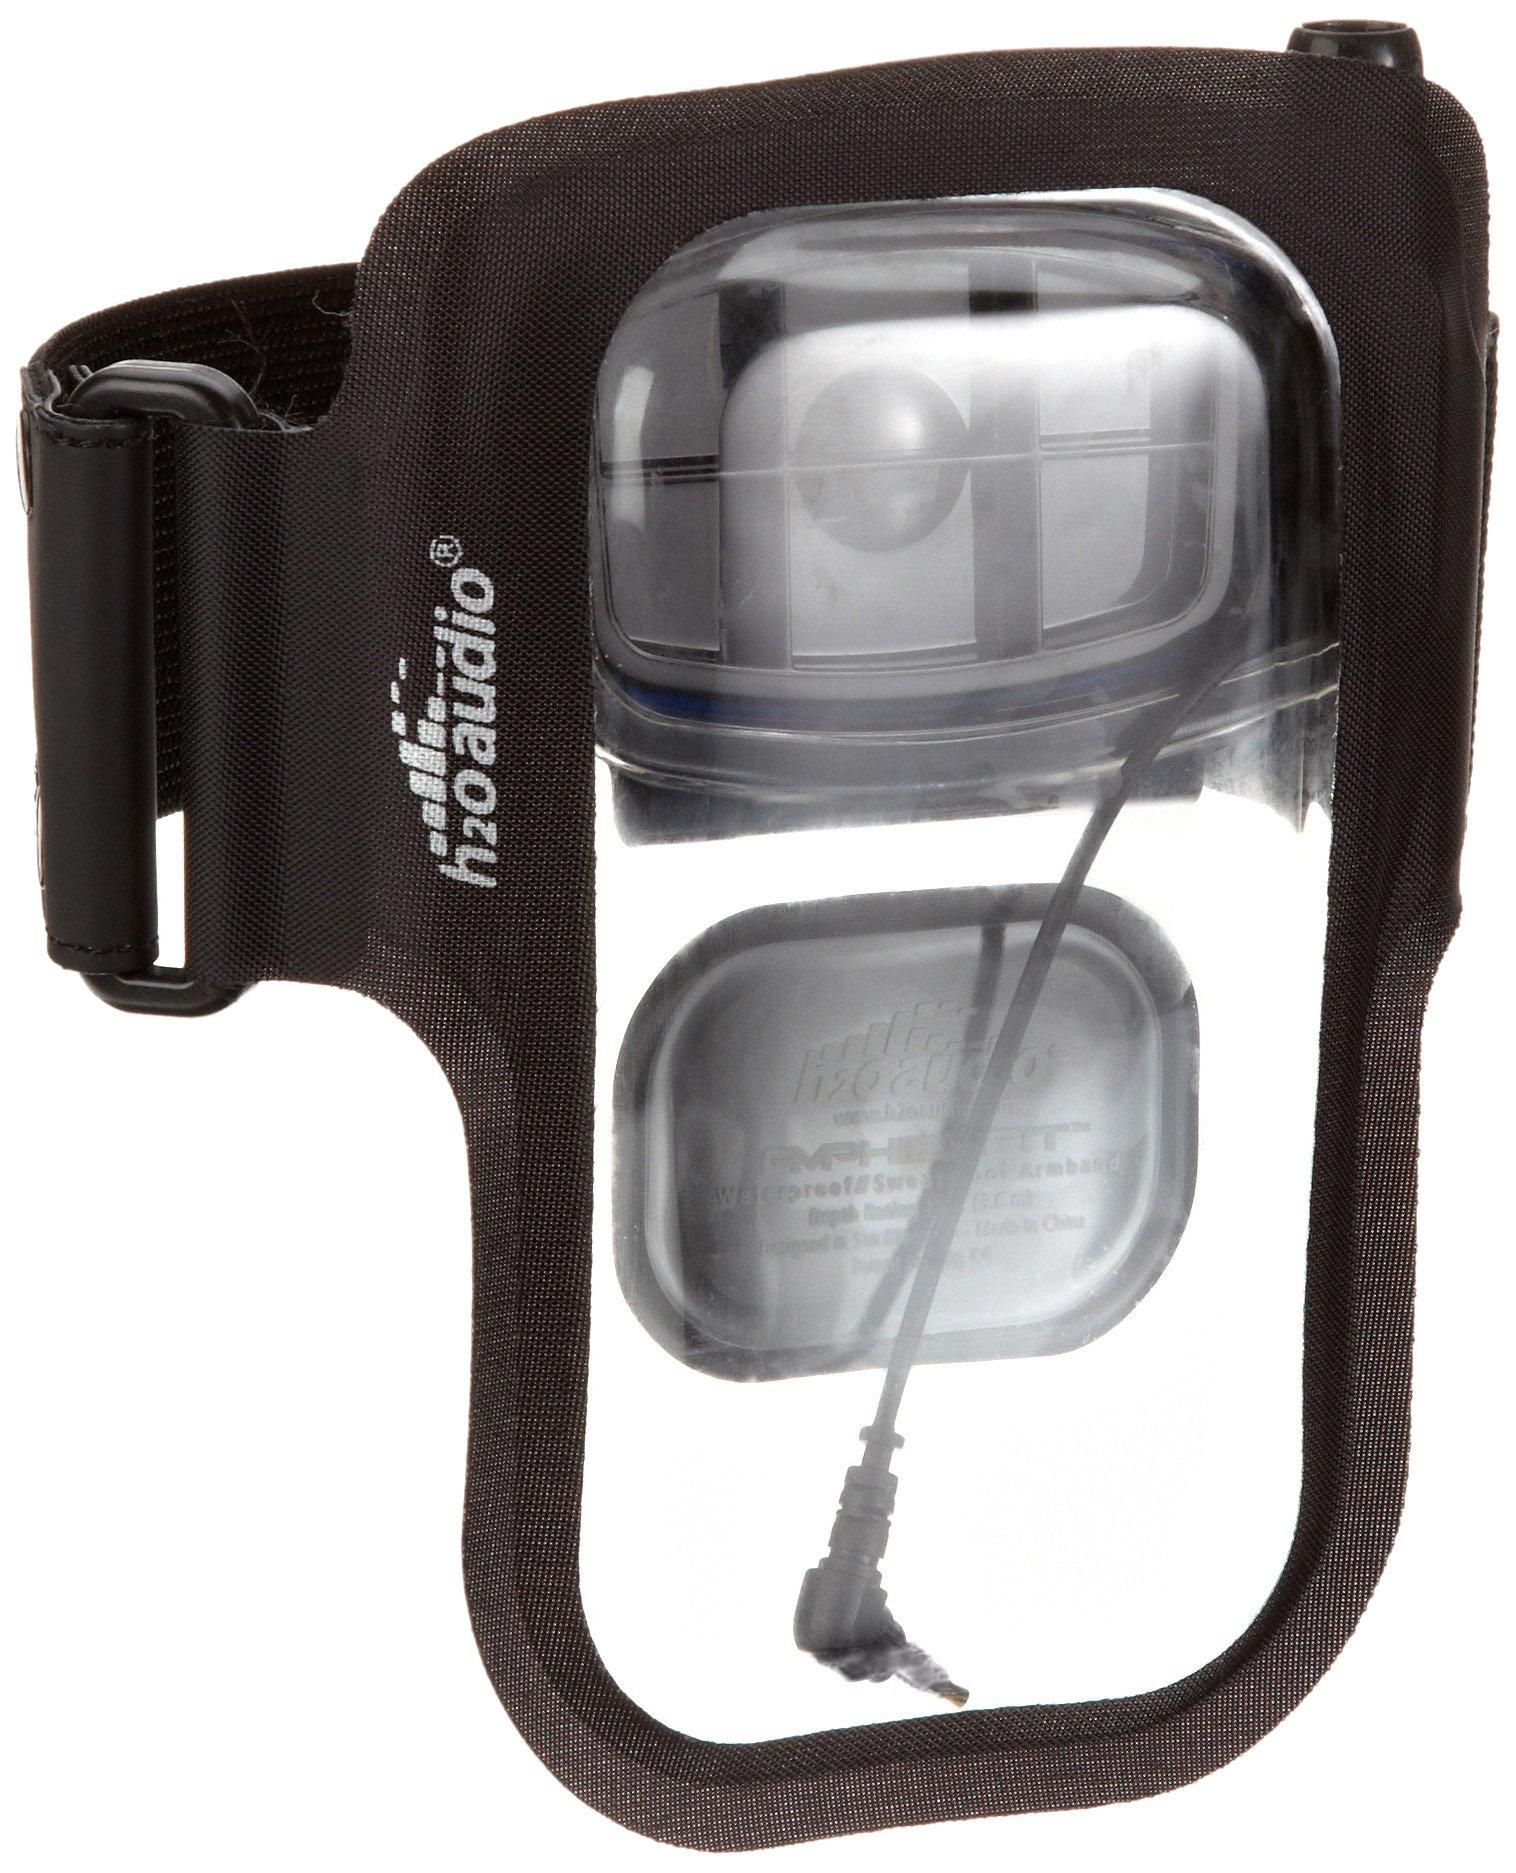 Amphibx Fit Waterproof and Sweatproof Armband